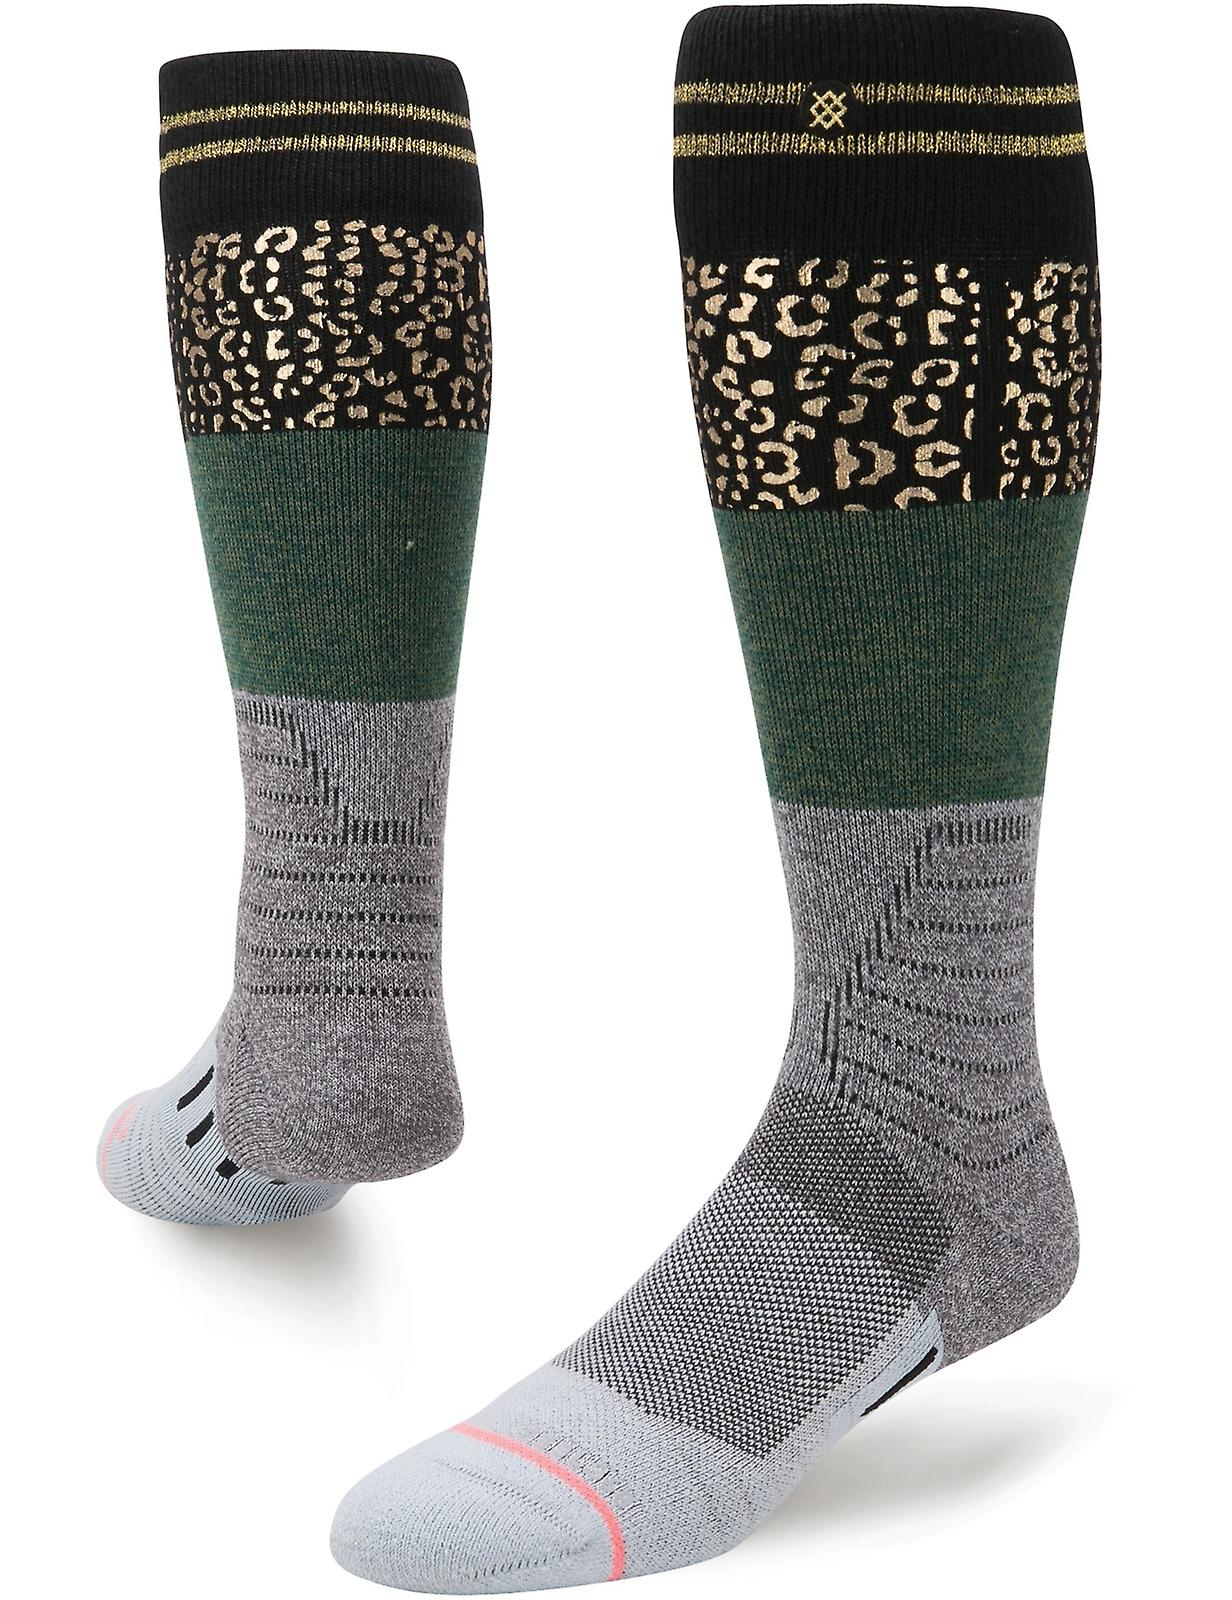 Stance Party Mtn Crew Socks